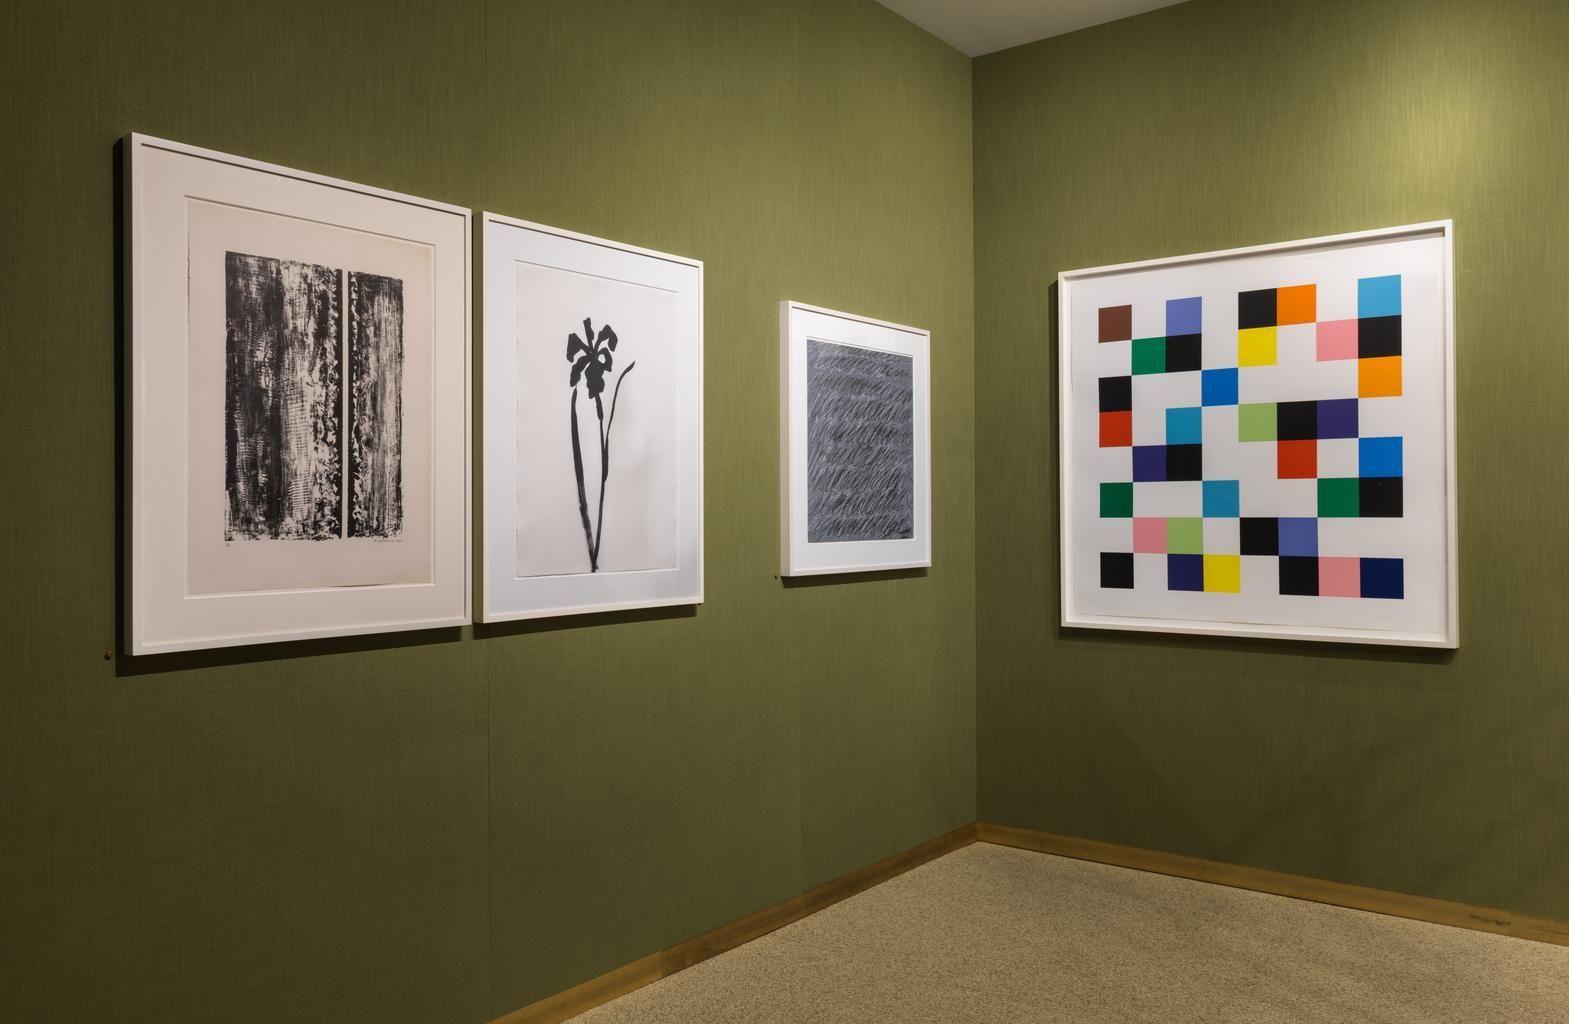 The ADAA Art Show 2017 at Susan Sheehan Gallery